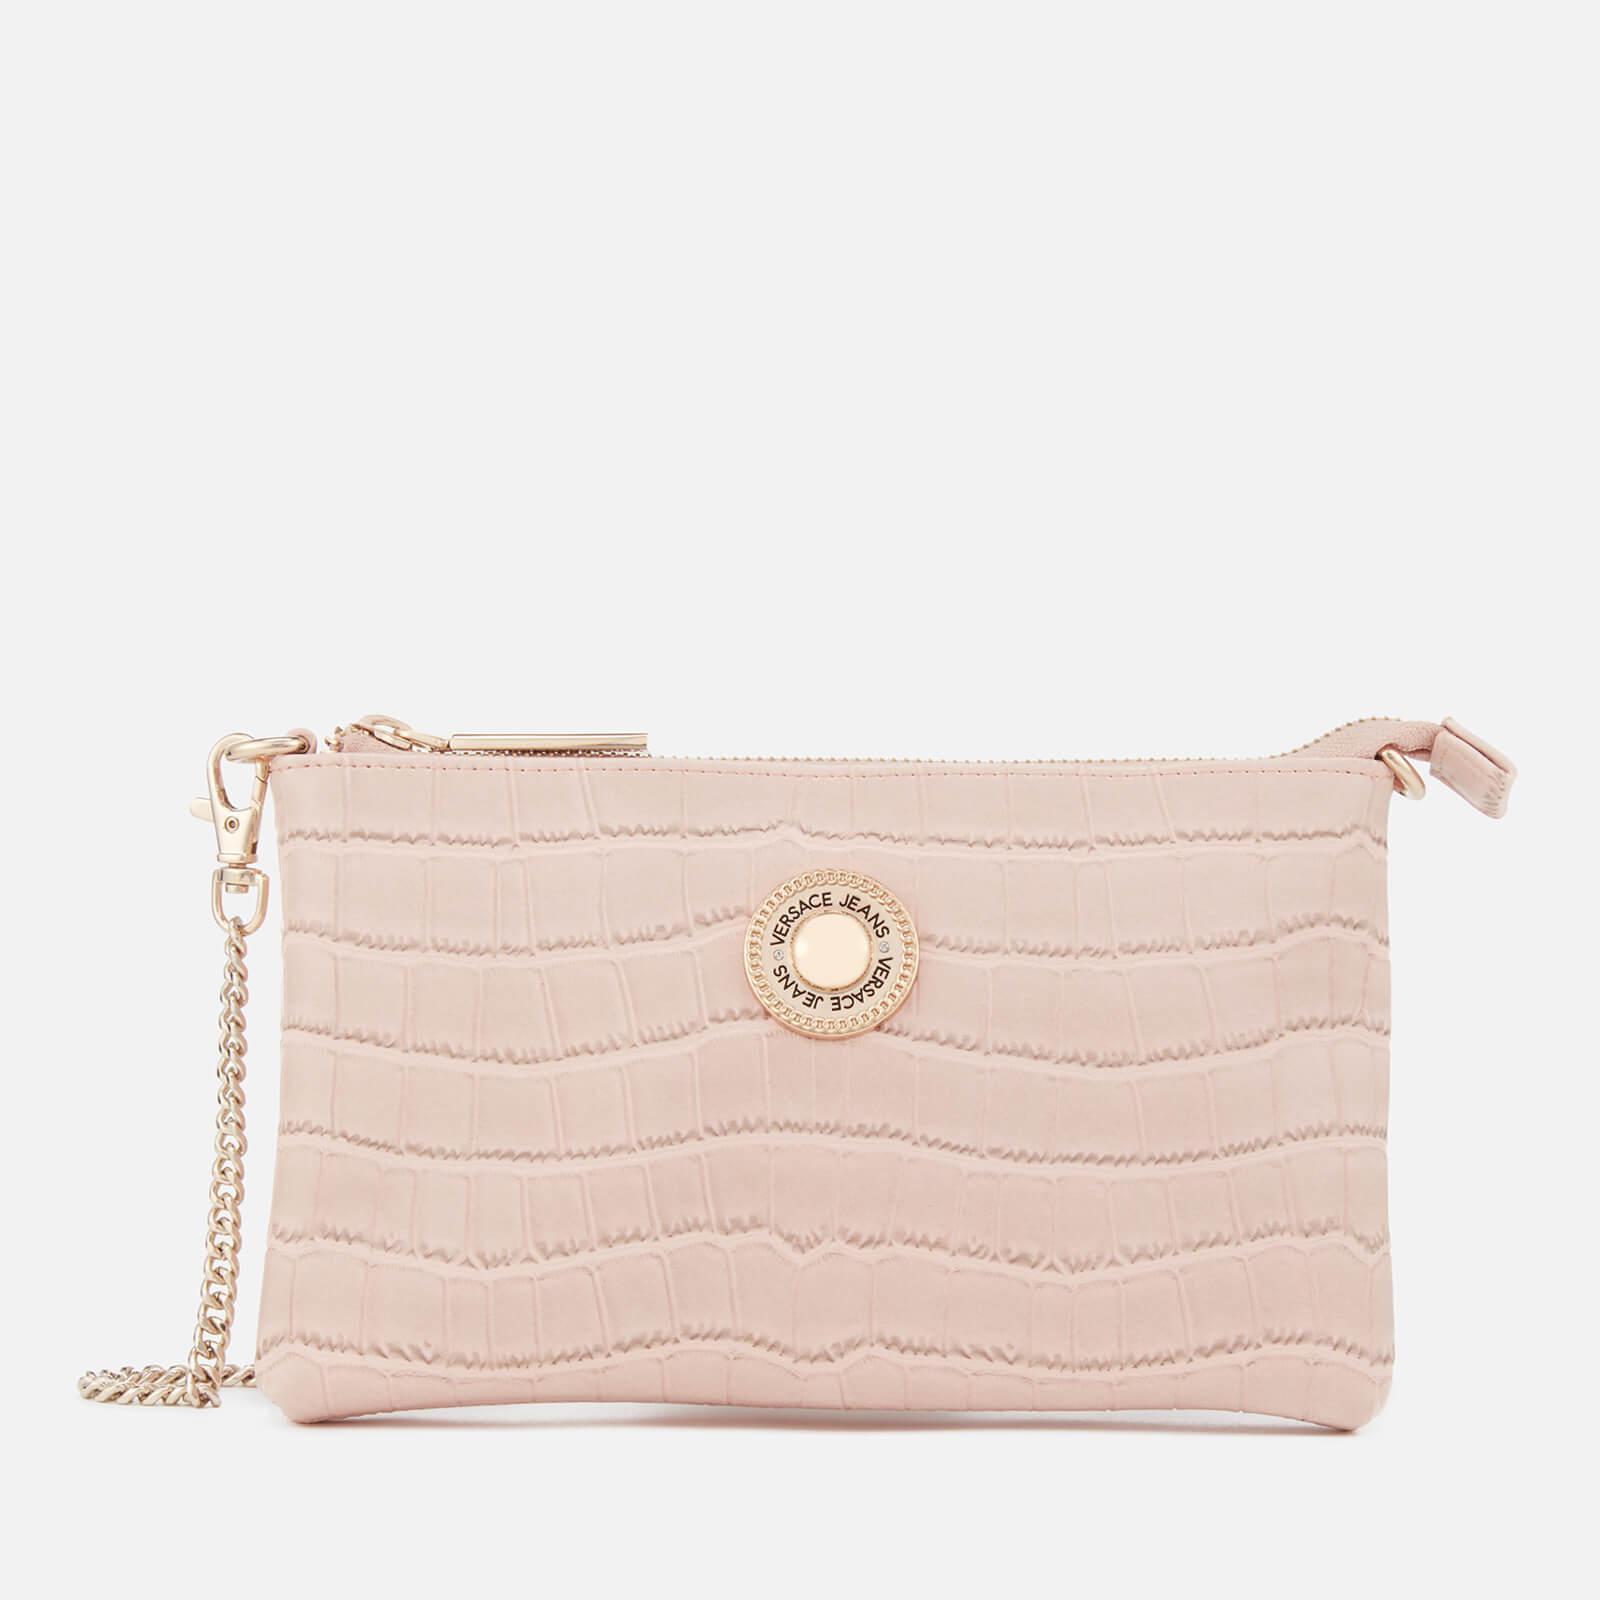 ce80fbf3d6f24 Versace Jeans Croc Print Clutch Bag in Pink - Lyst